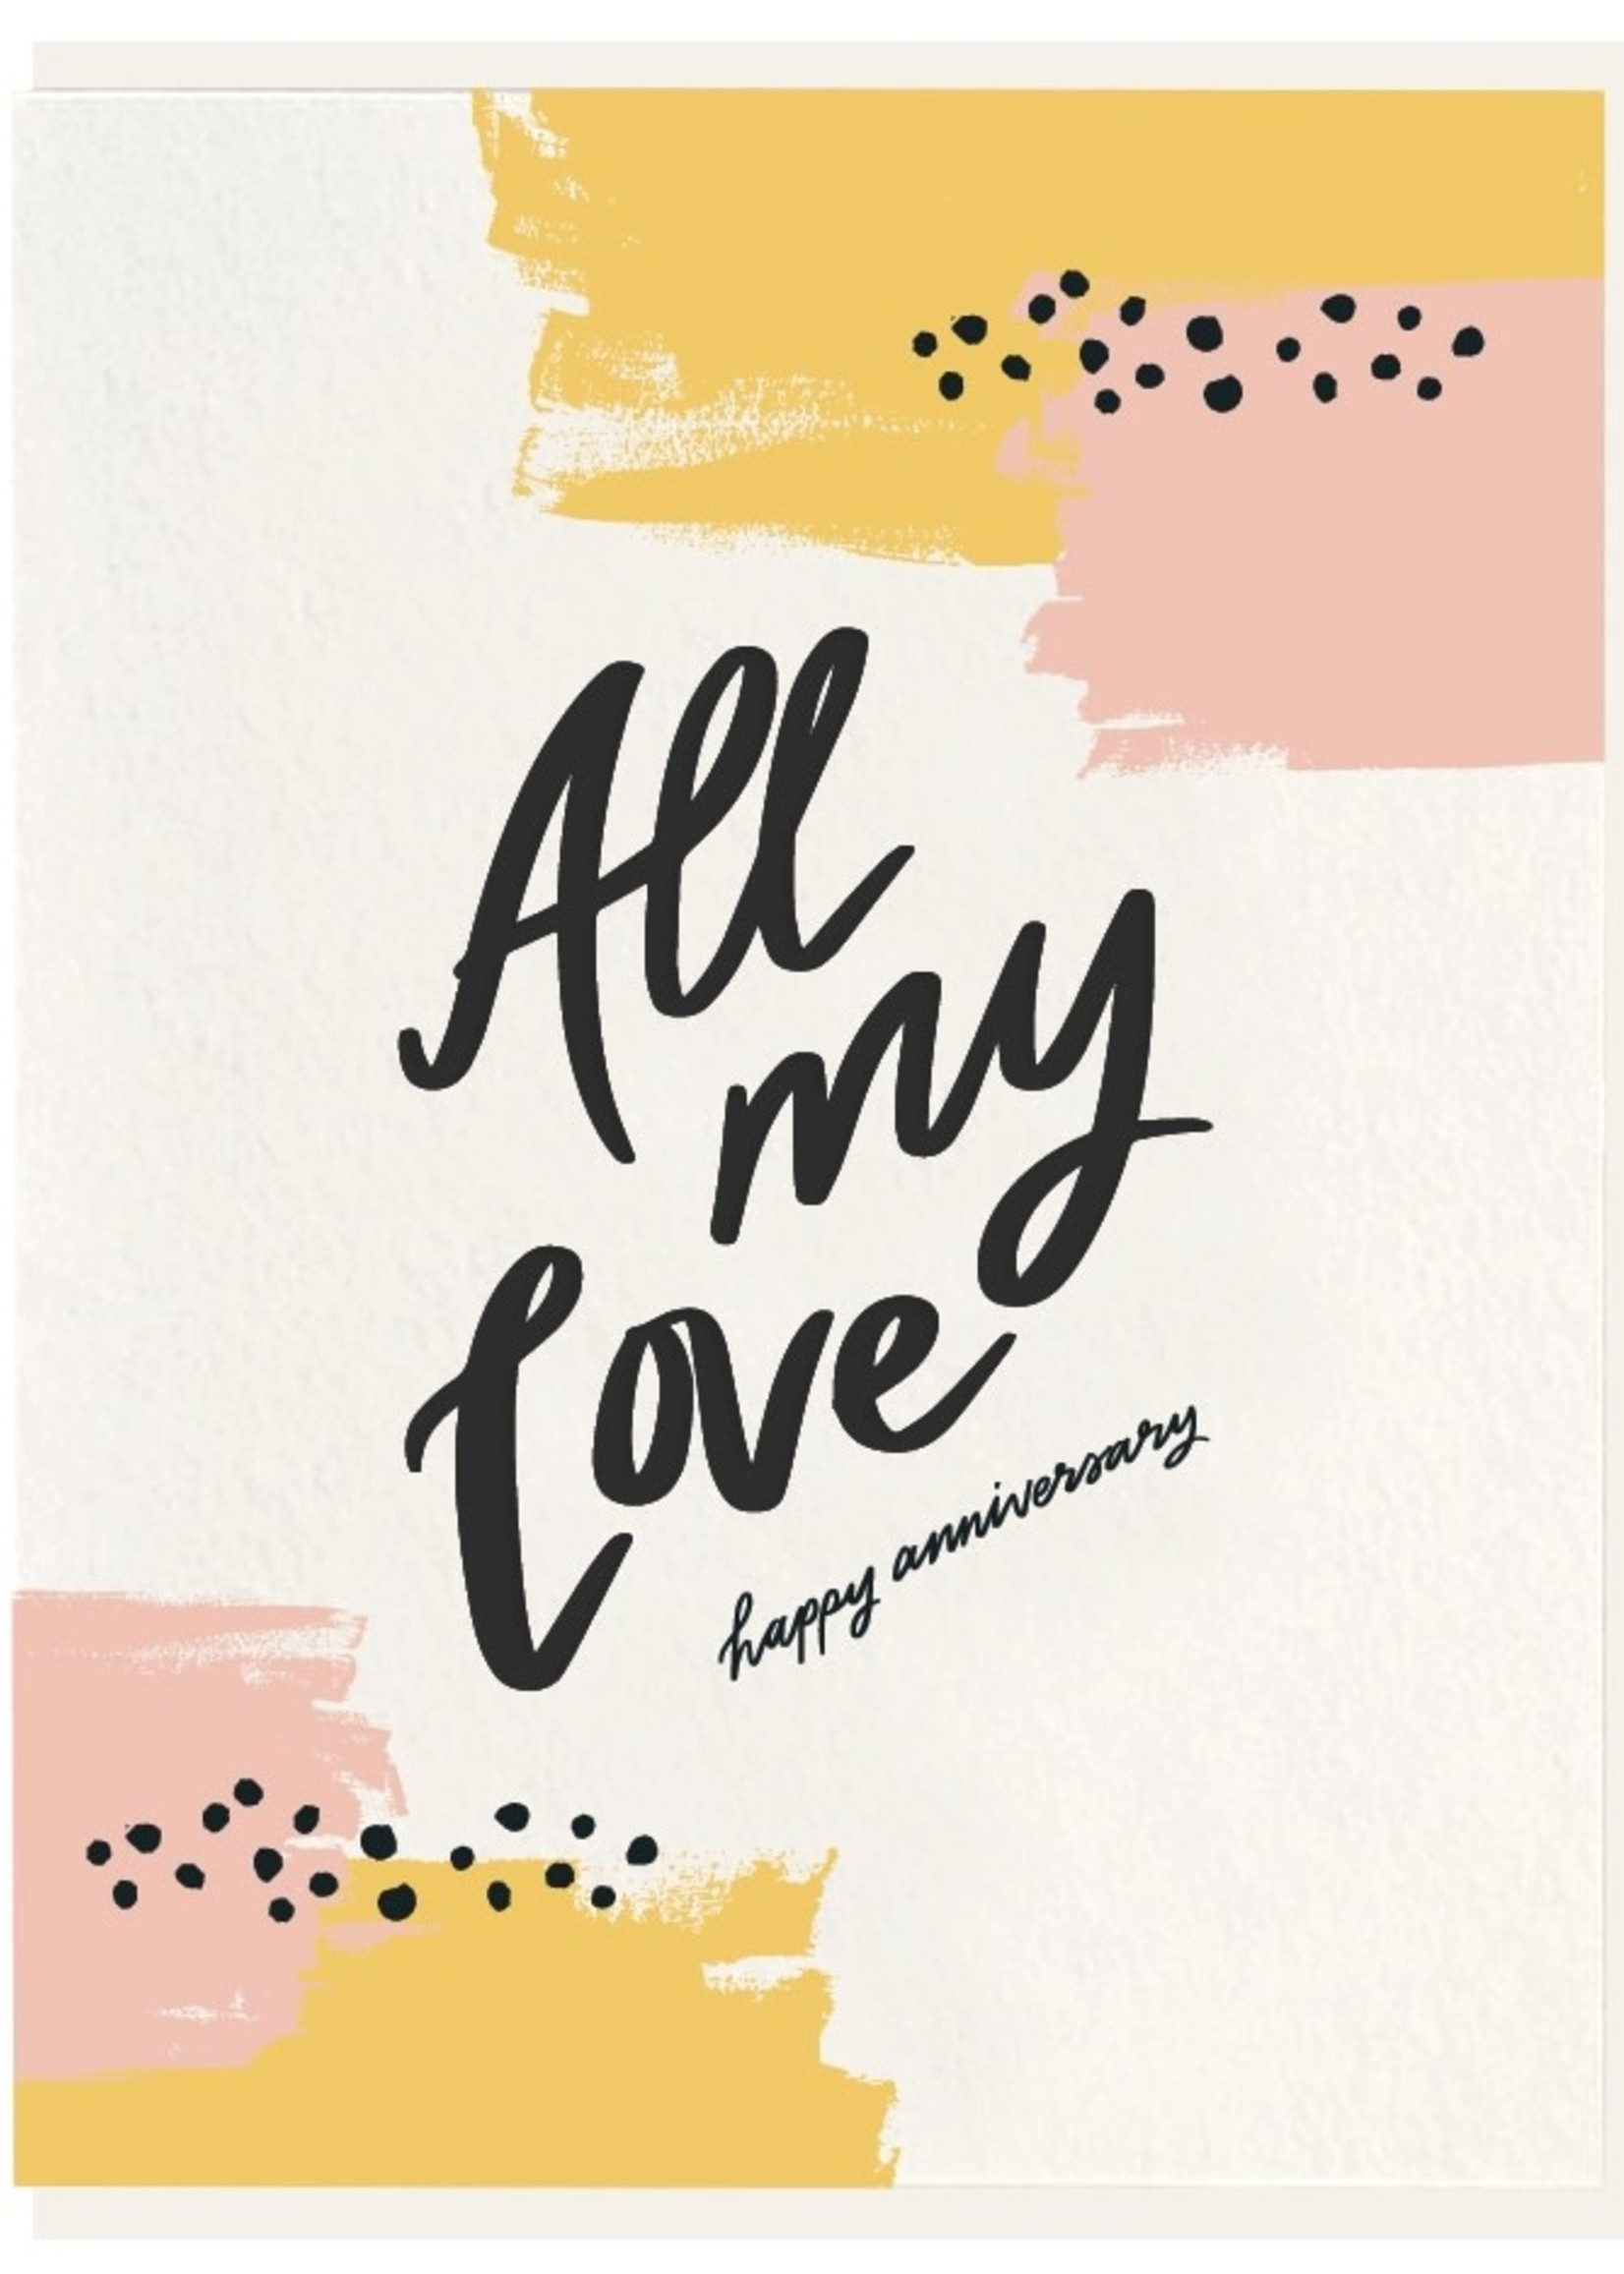 DAHLIA PRESS ALL MY LOVE CARD